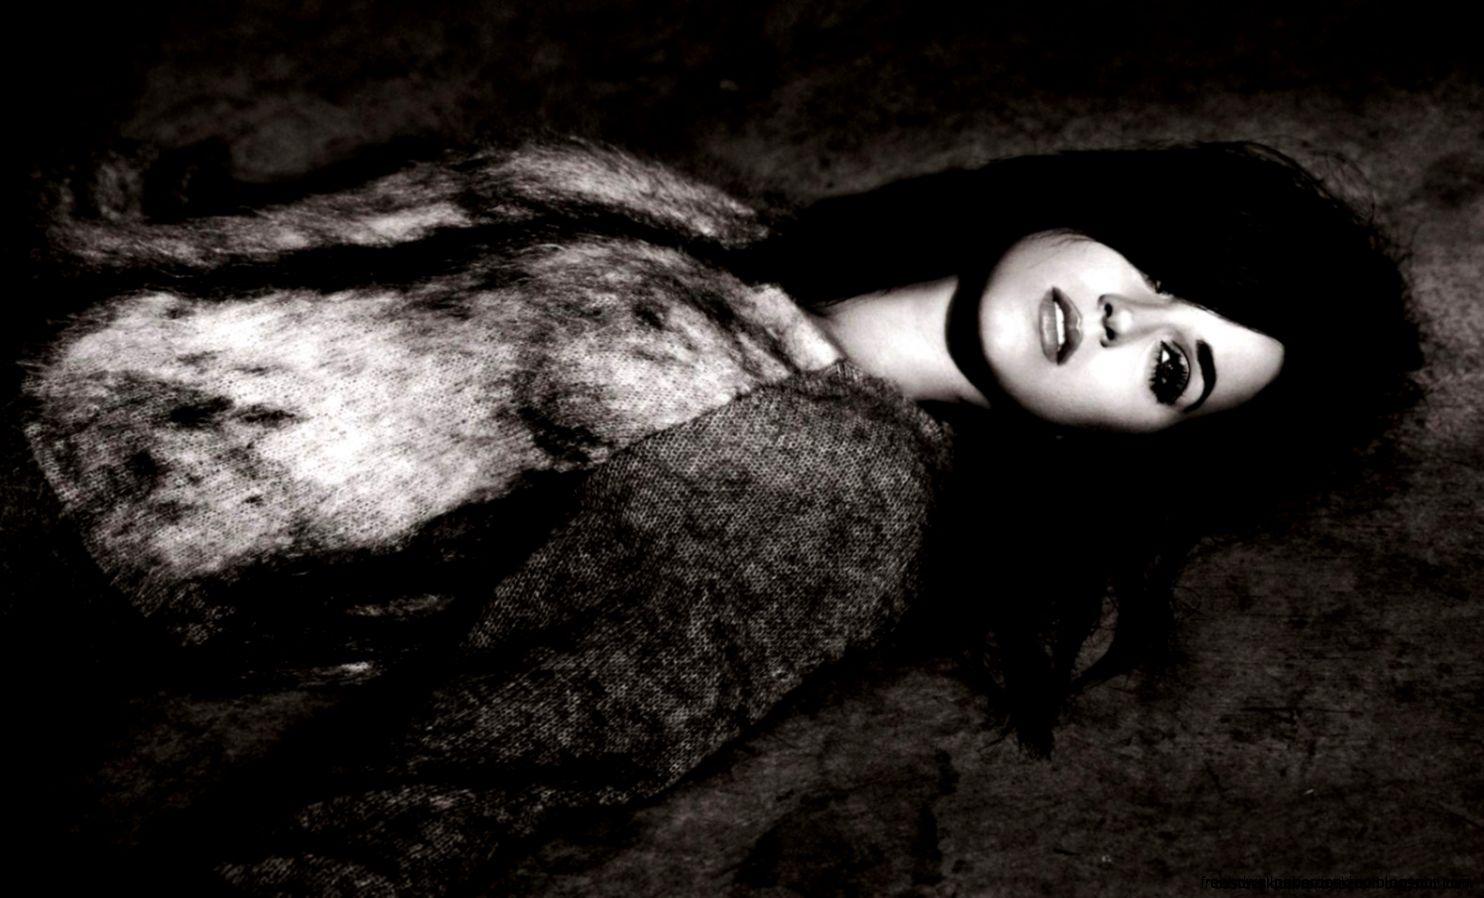 Brunette Katy Perry Singer Hd Wallpaper  Best Desktop Wallpapers